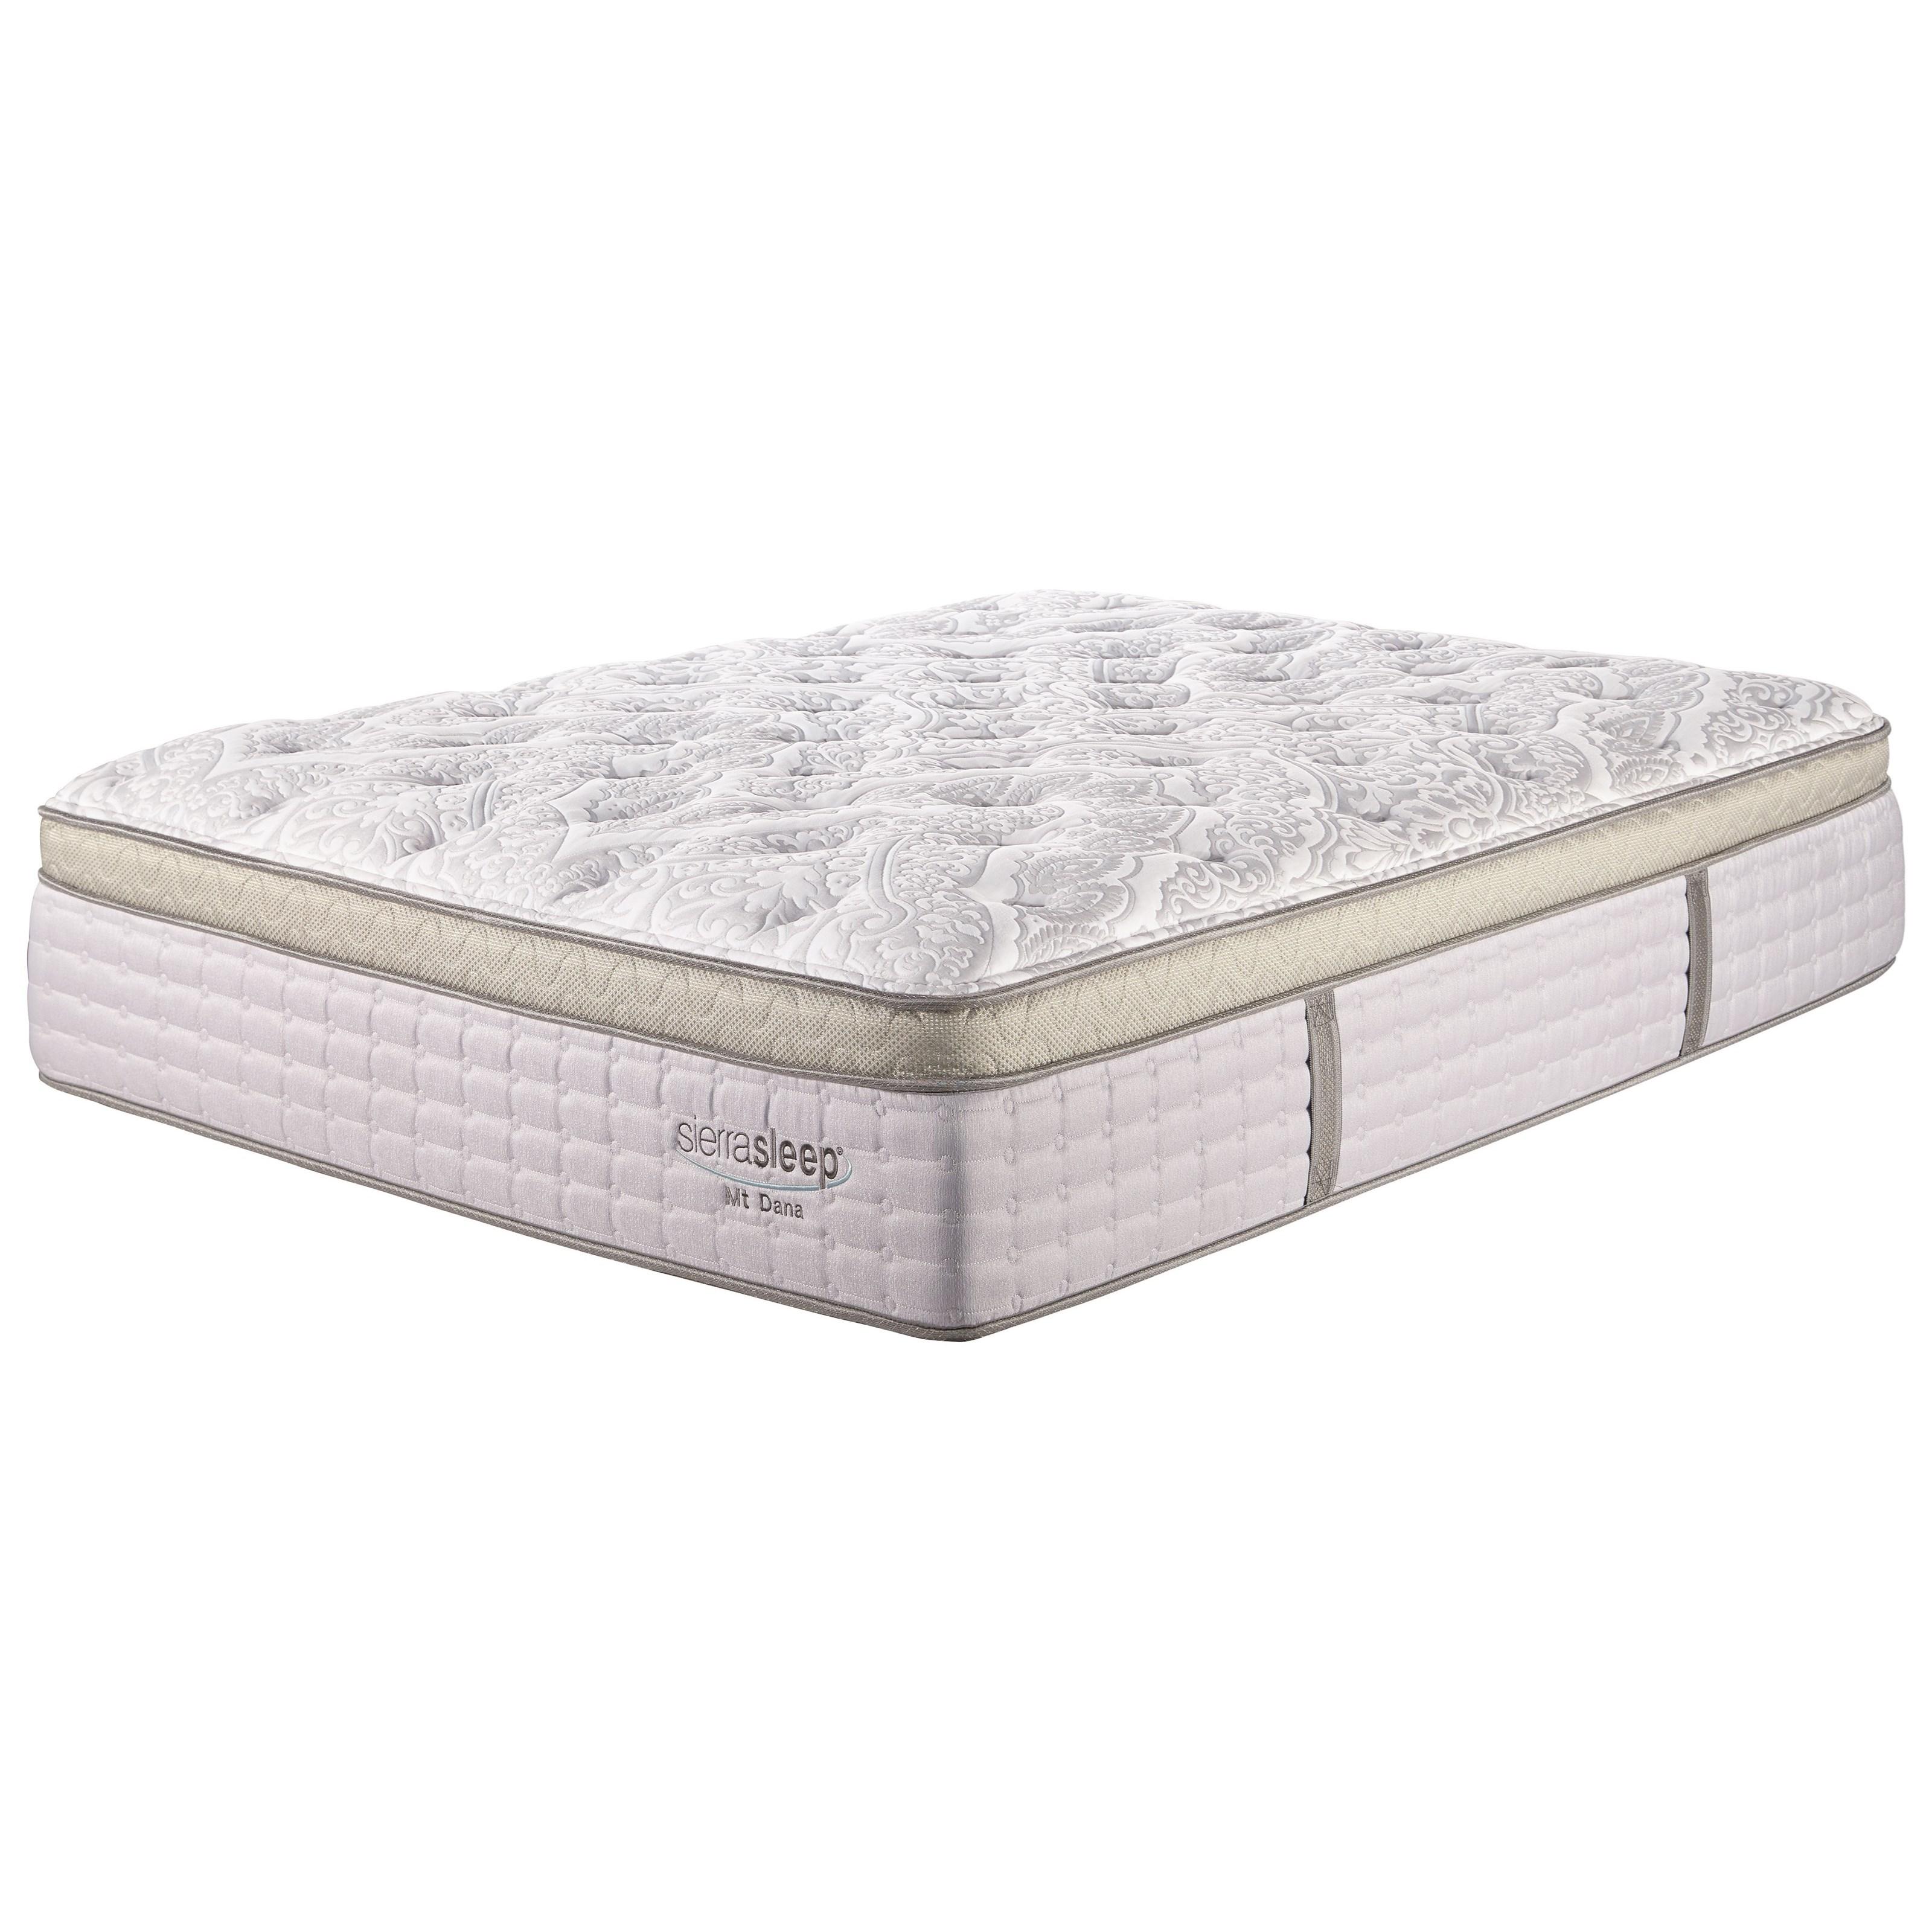 Sierra Sleep Mount Dana Full Euro Top Mattress - Item Number: M95821